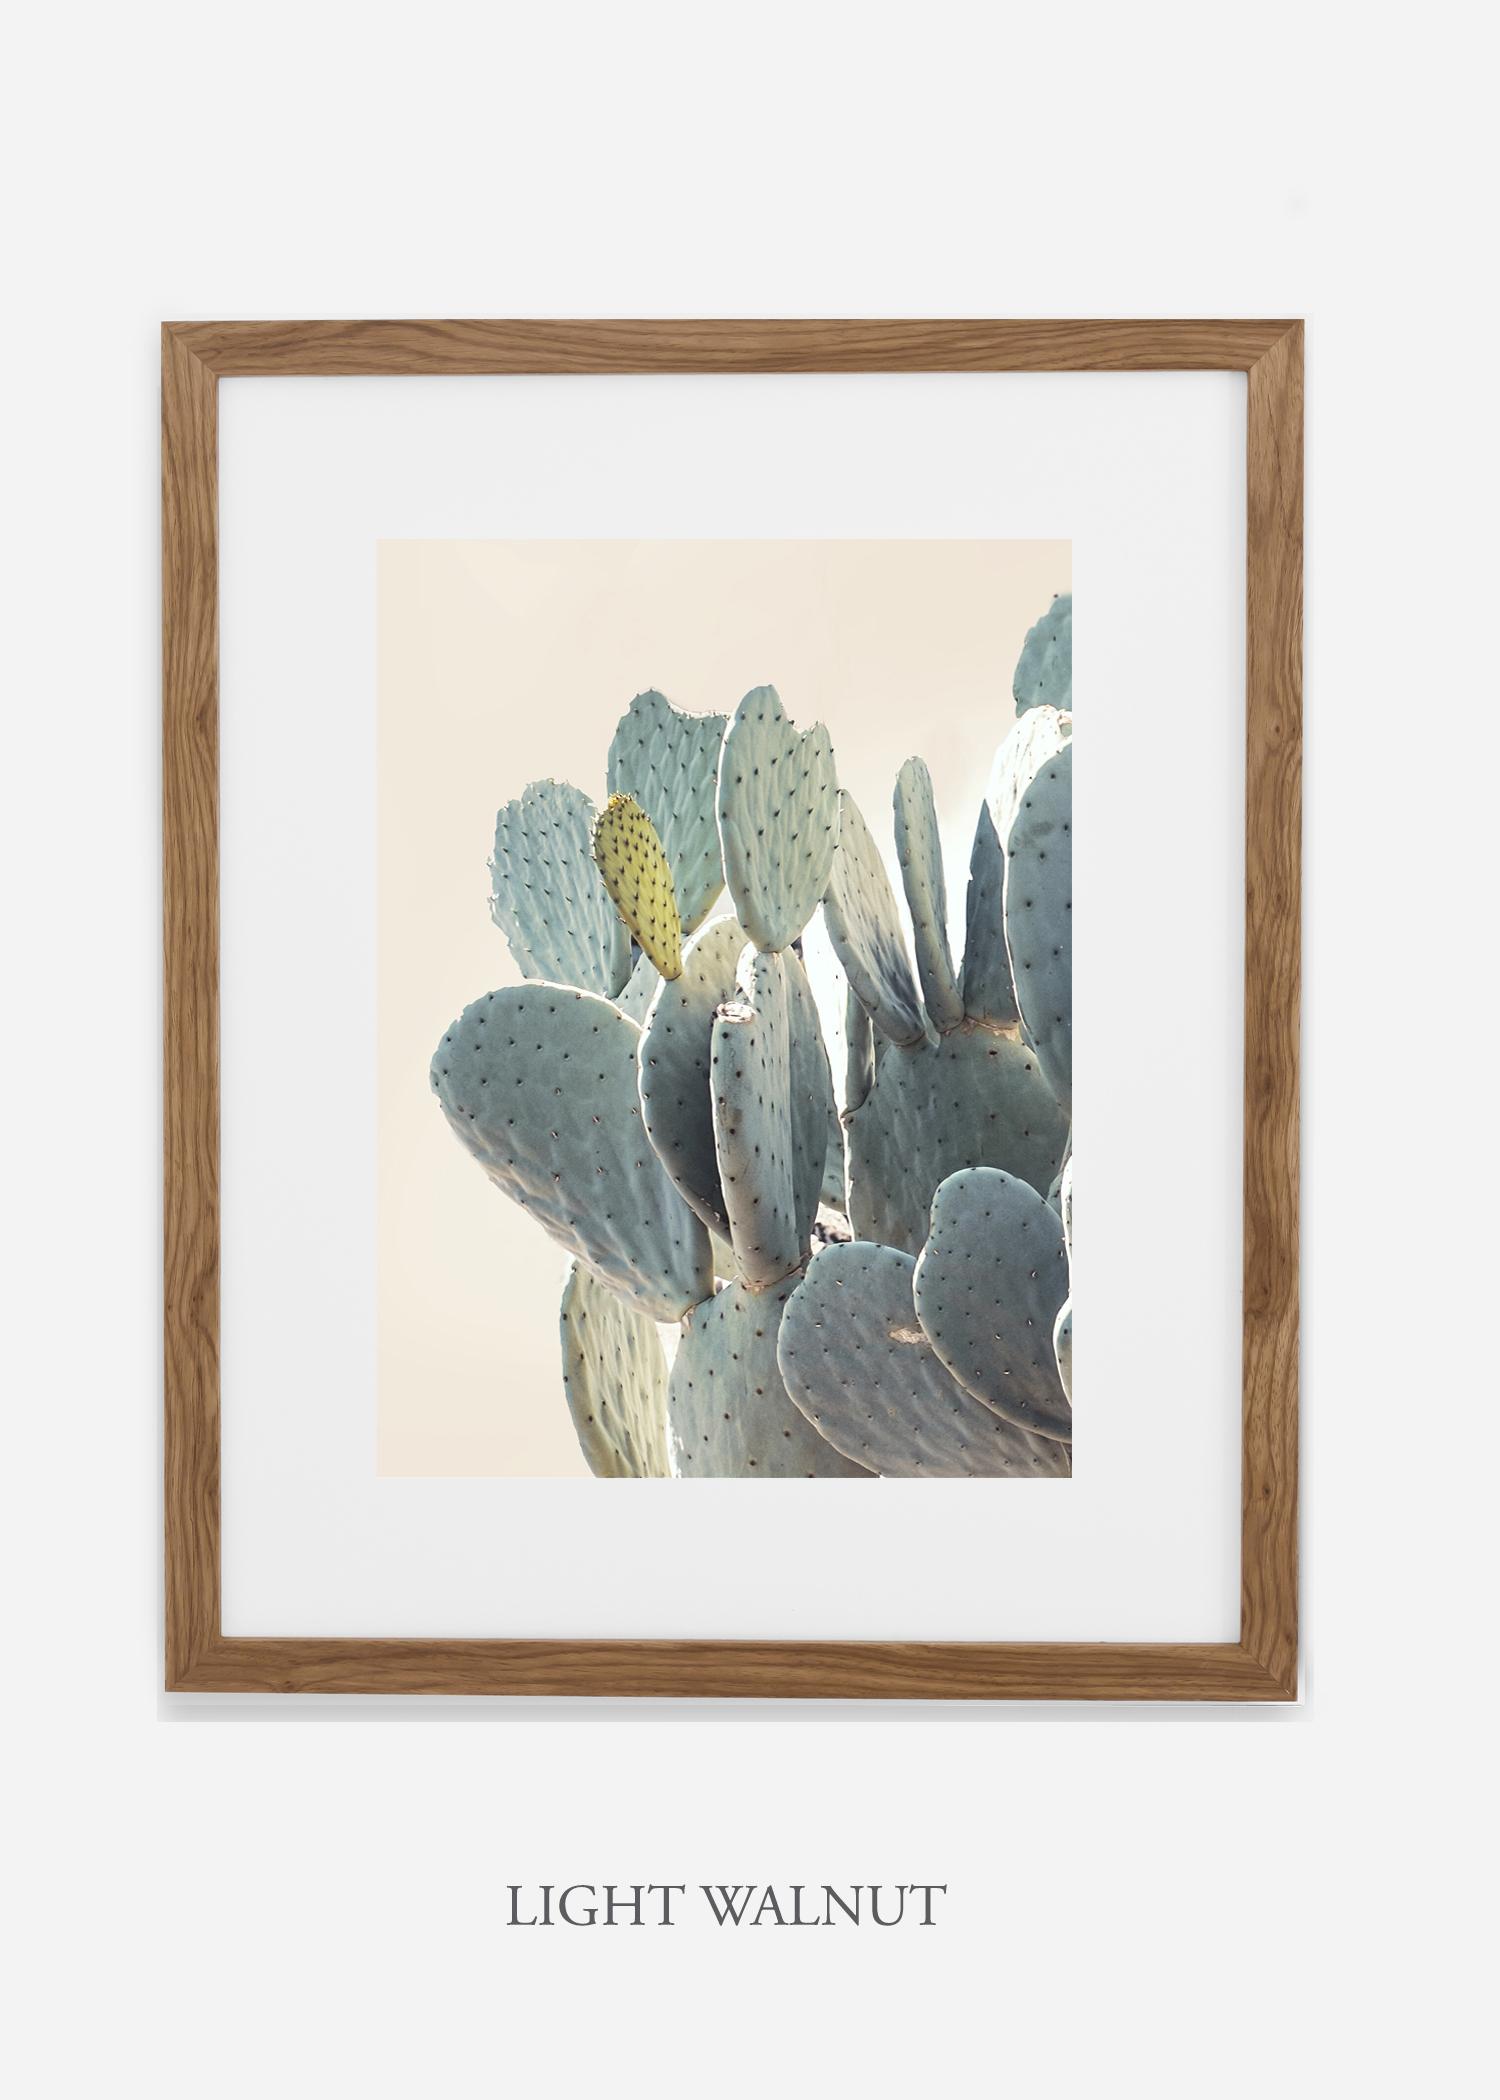 Desert_lightwalnutframe_DesertDetails_Cactus__Art_Photography_interiordesign_bohemian_cactusart.jpg